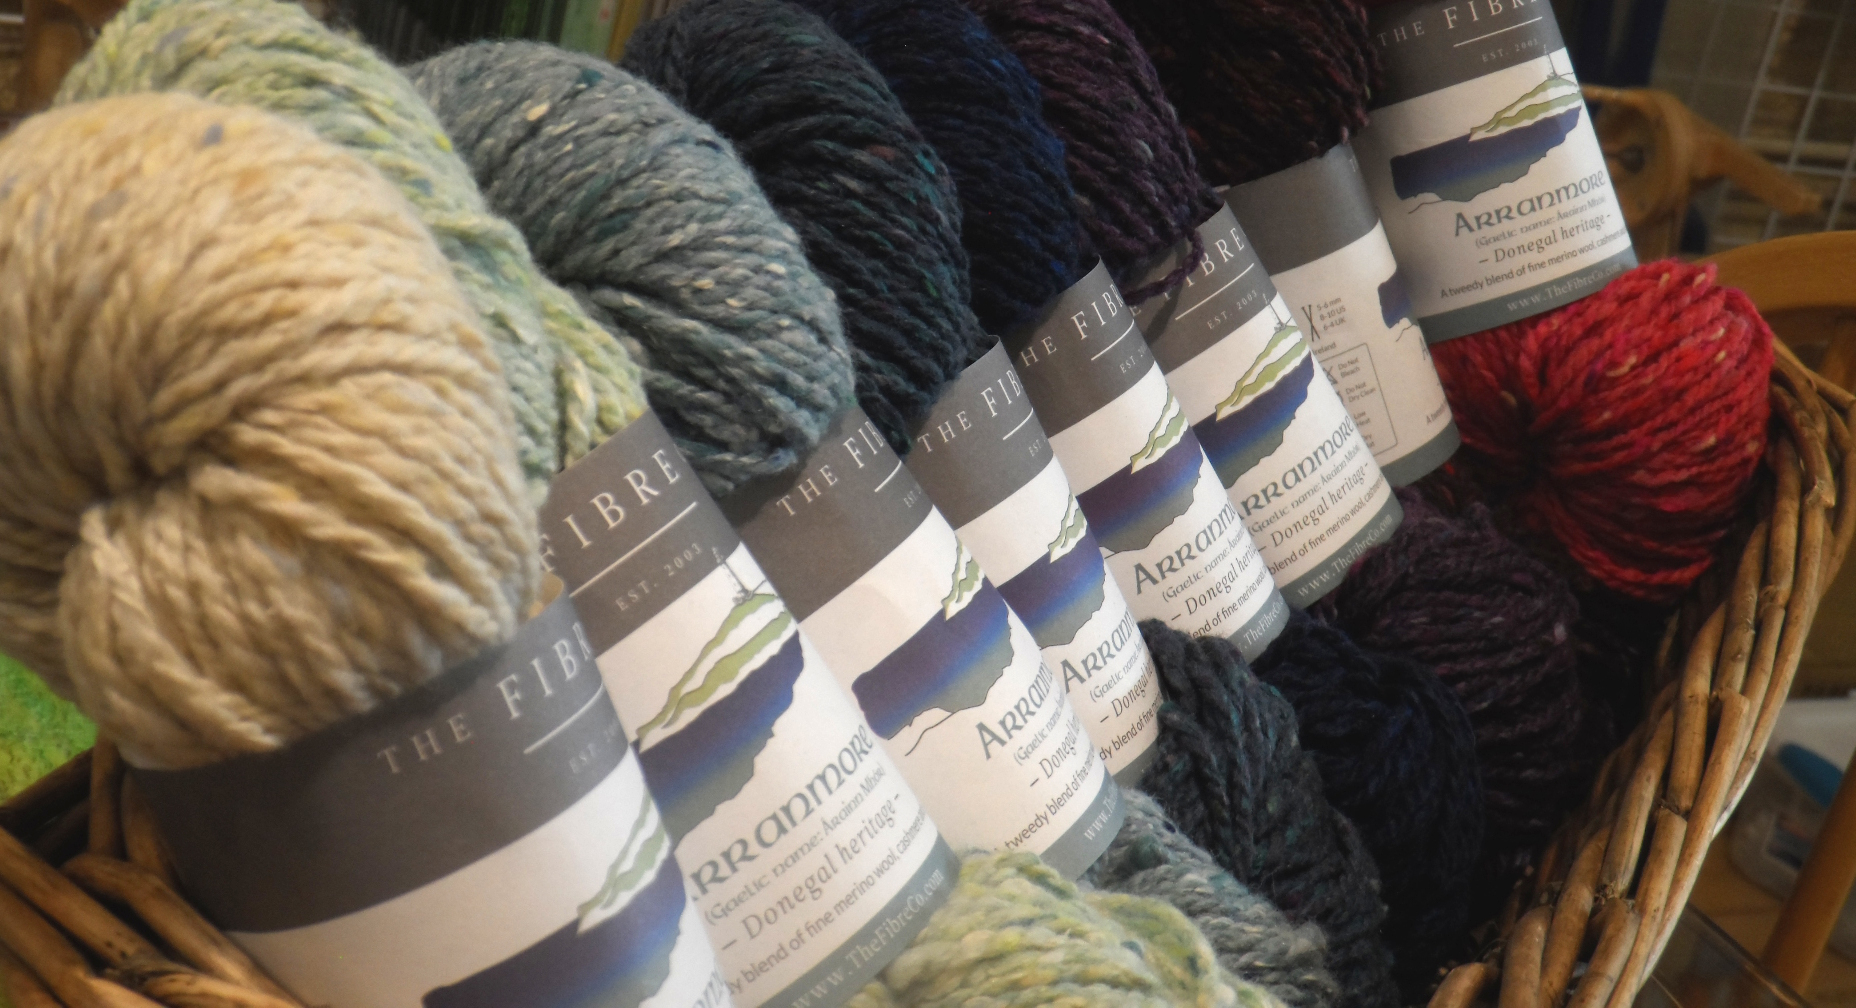 Arranmore Yarn